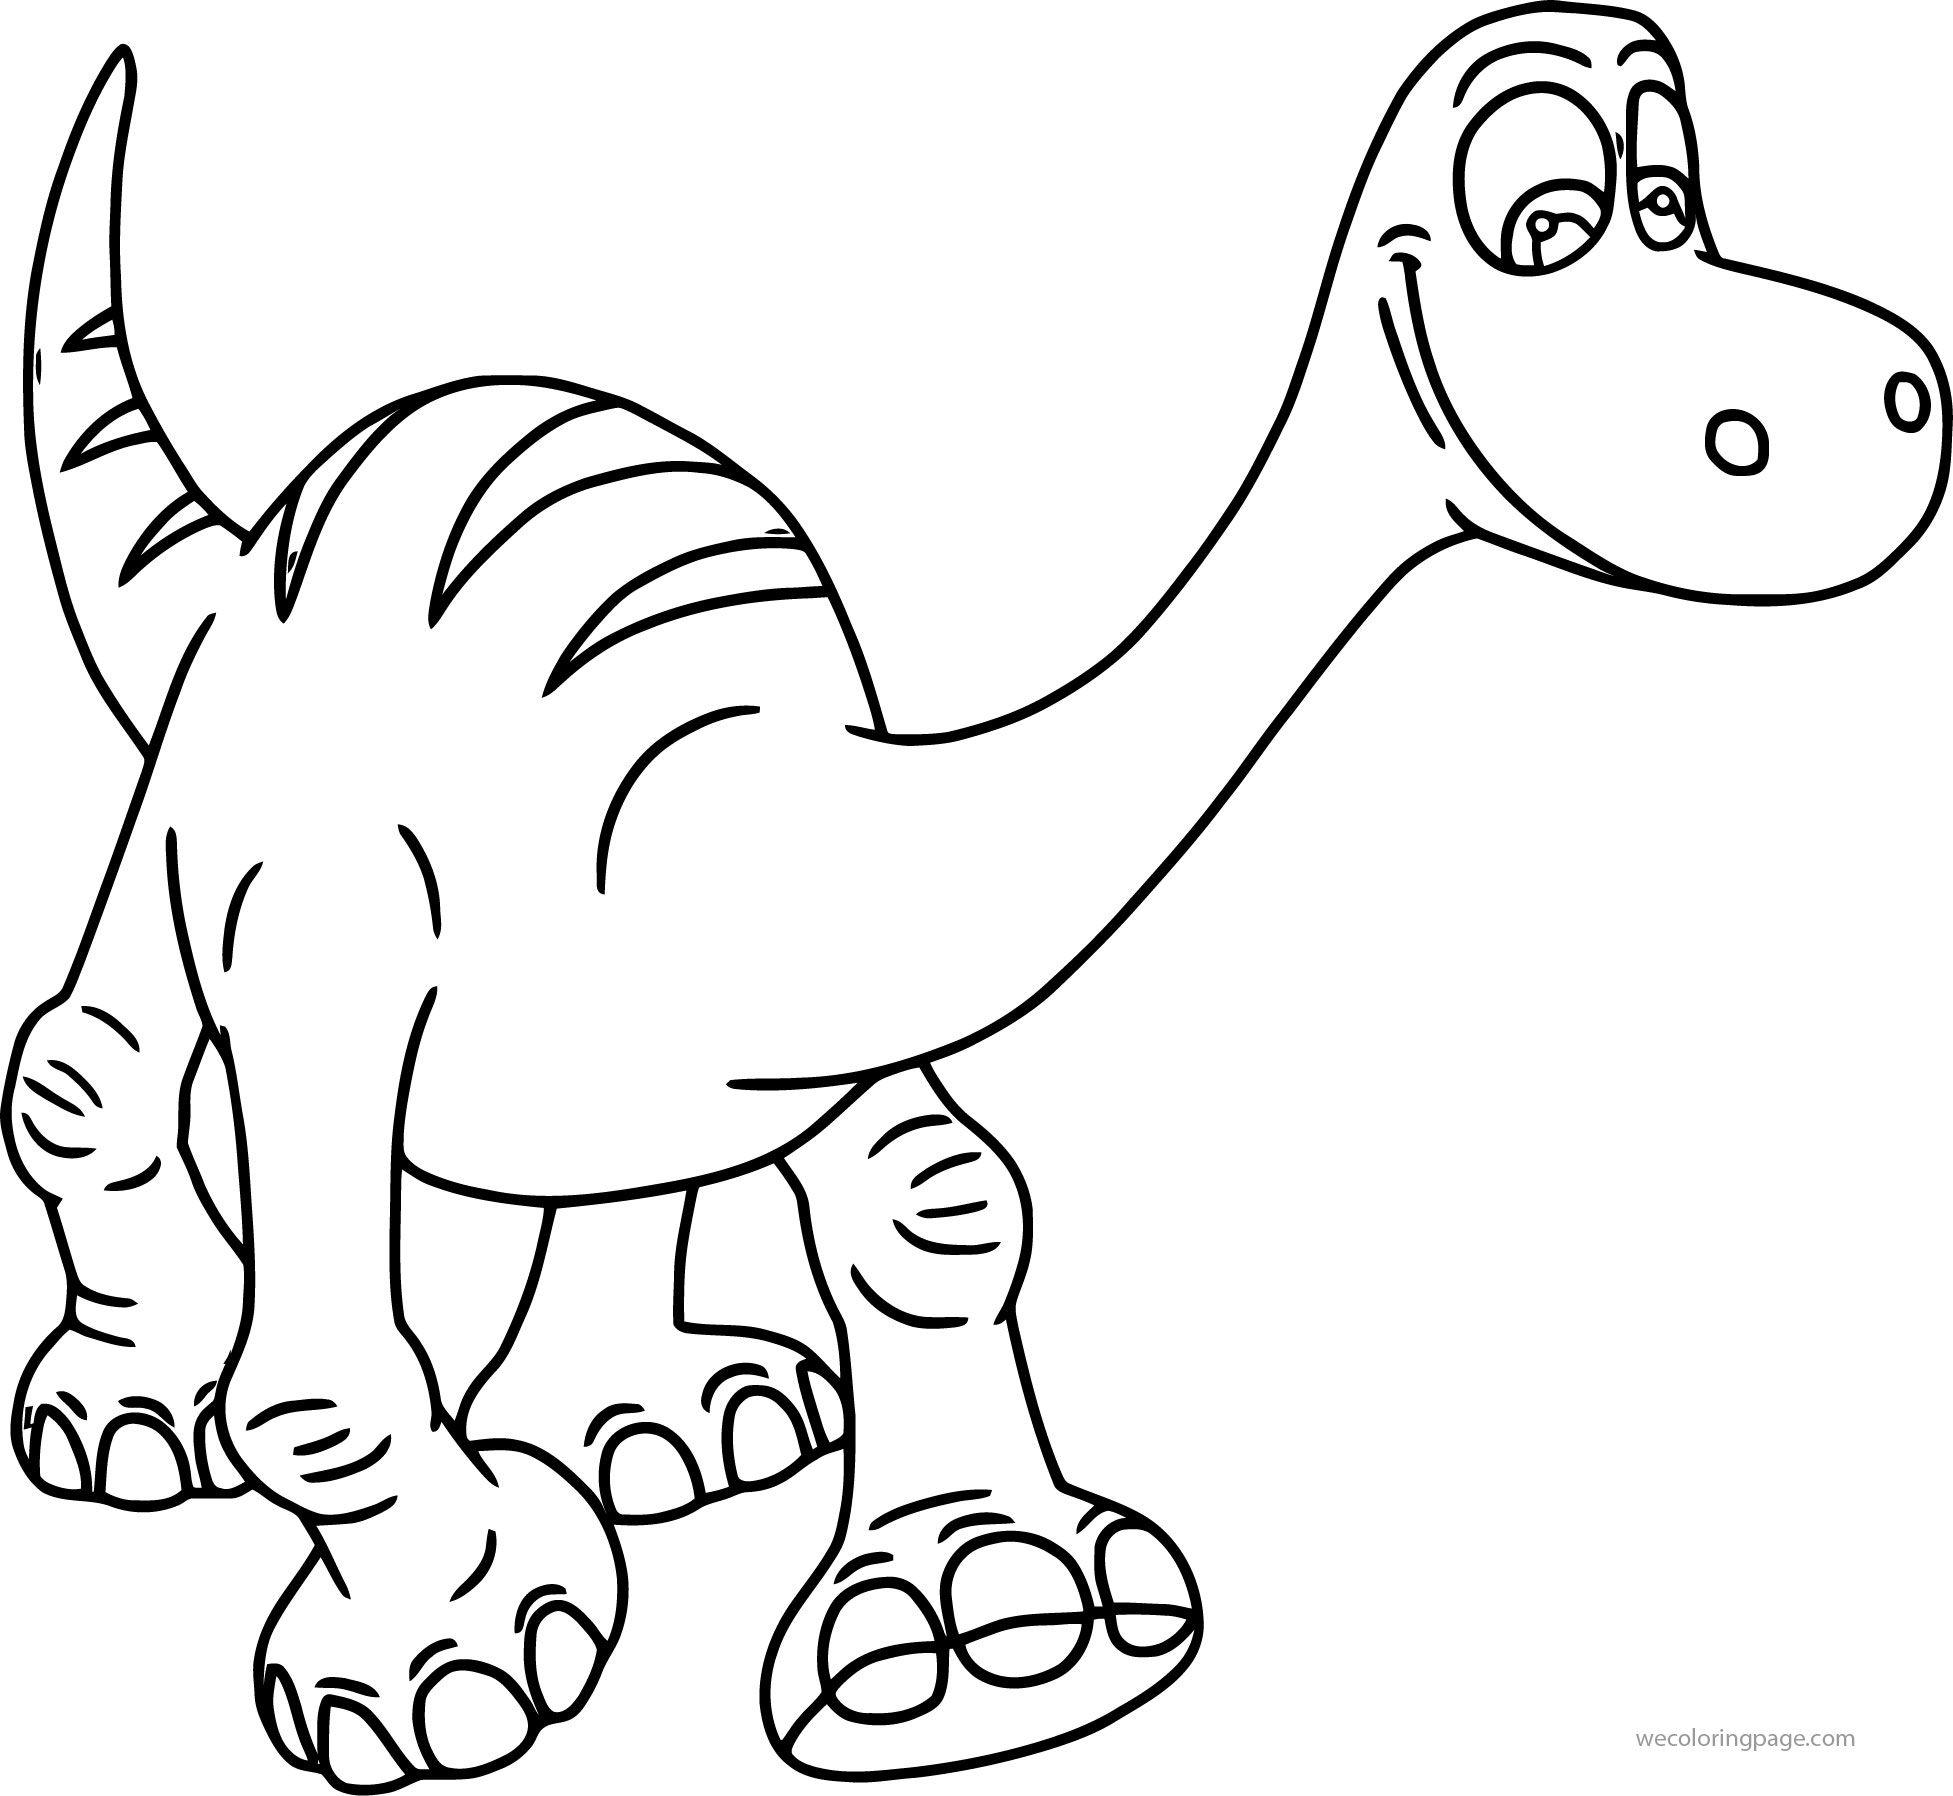 The Good Dinosaur Disney Coloring Pages Kolorowanki Antosia D